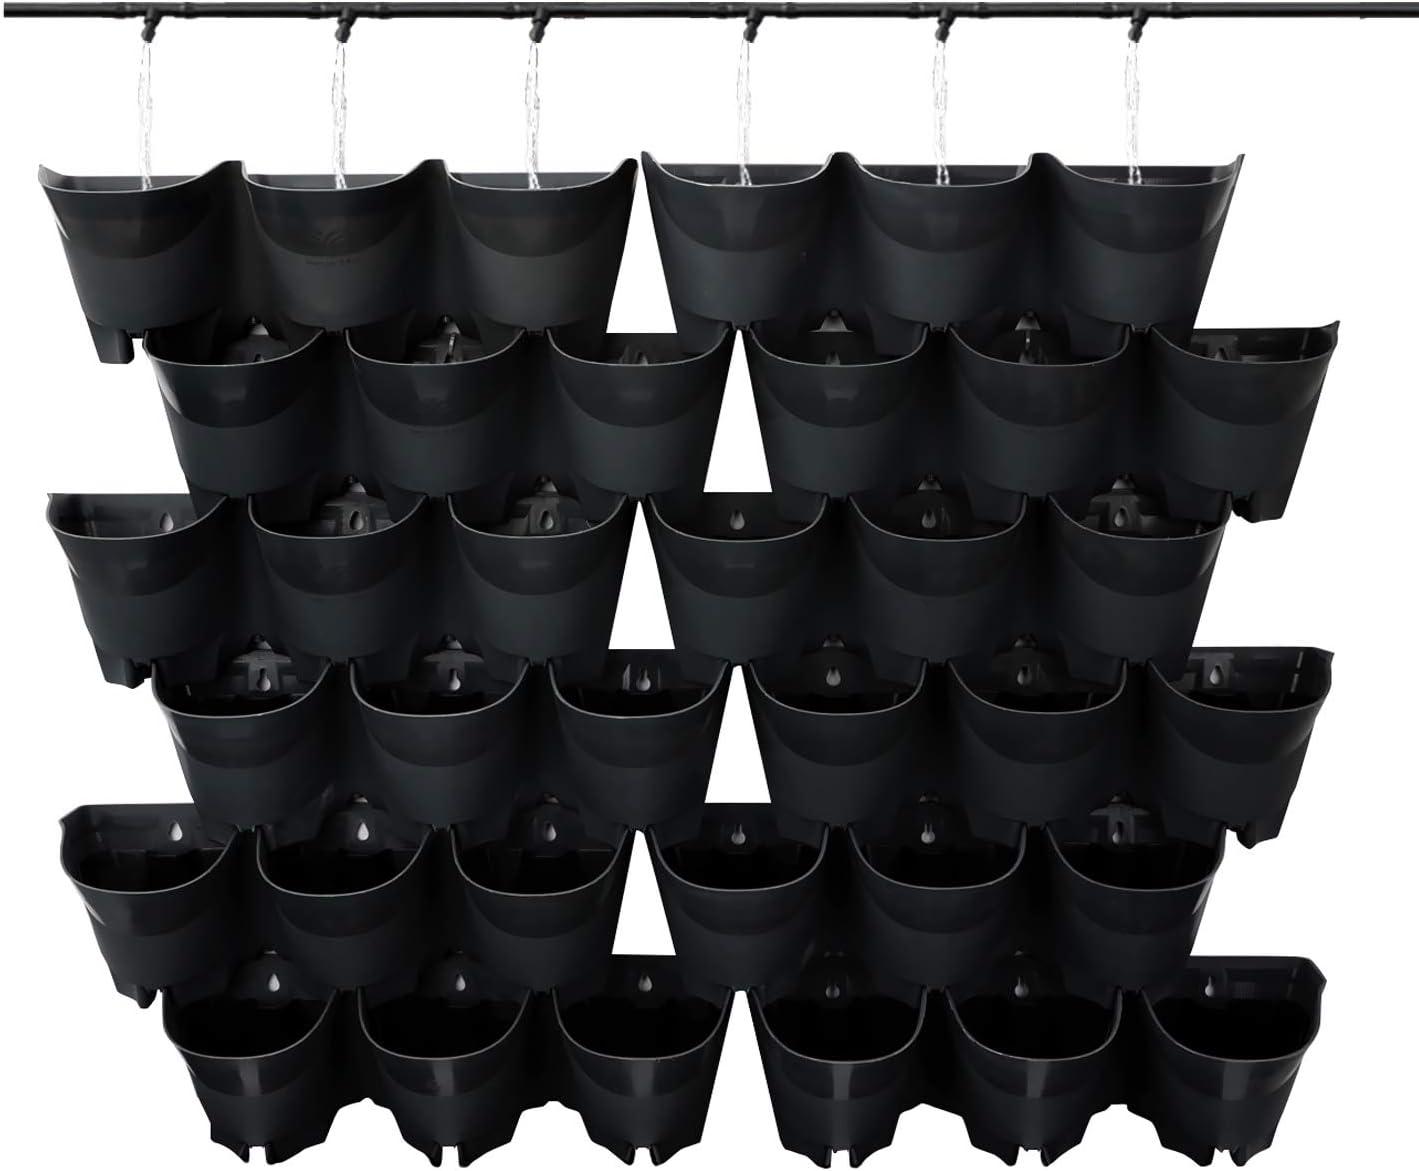 Amazon Com Worth Garden 12 Sets Self Watering Vertical Wall Planters 36 Pockets Total Indoor Outdoor Wall Hangers Black Home Kitchen